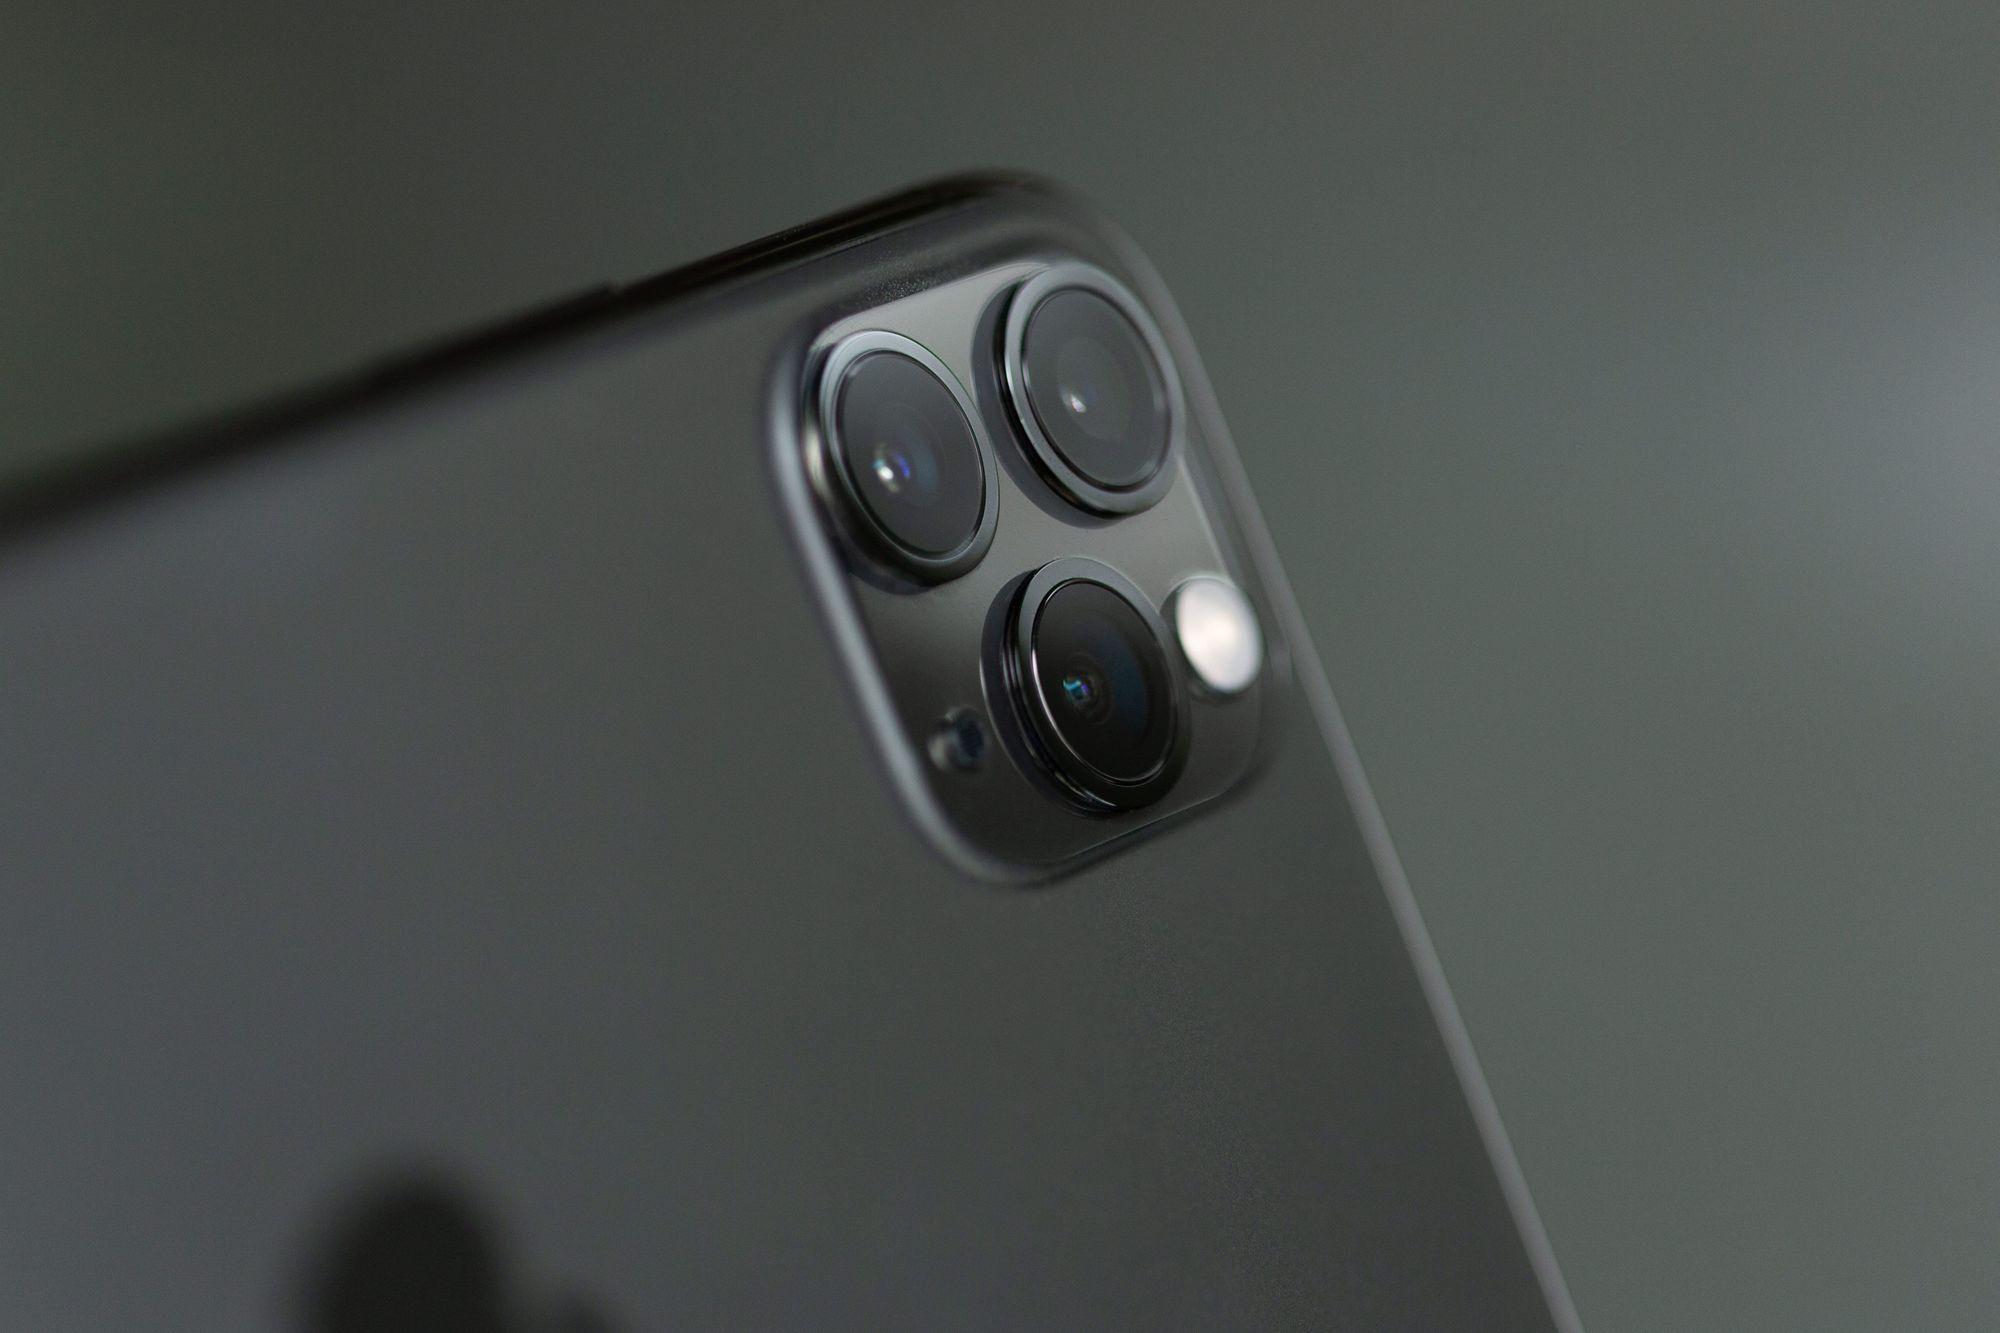 iPhone filmmaking basics